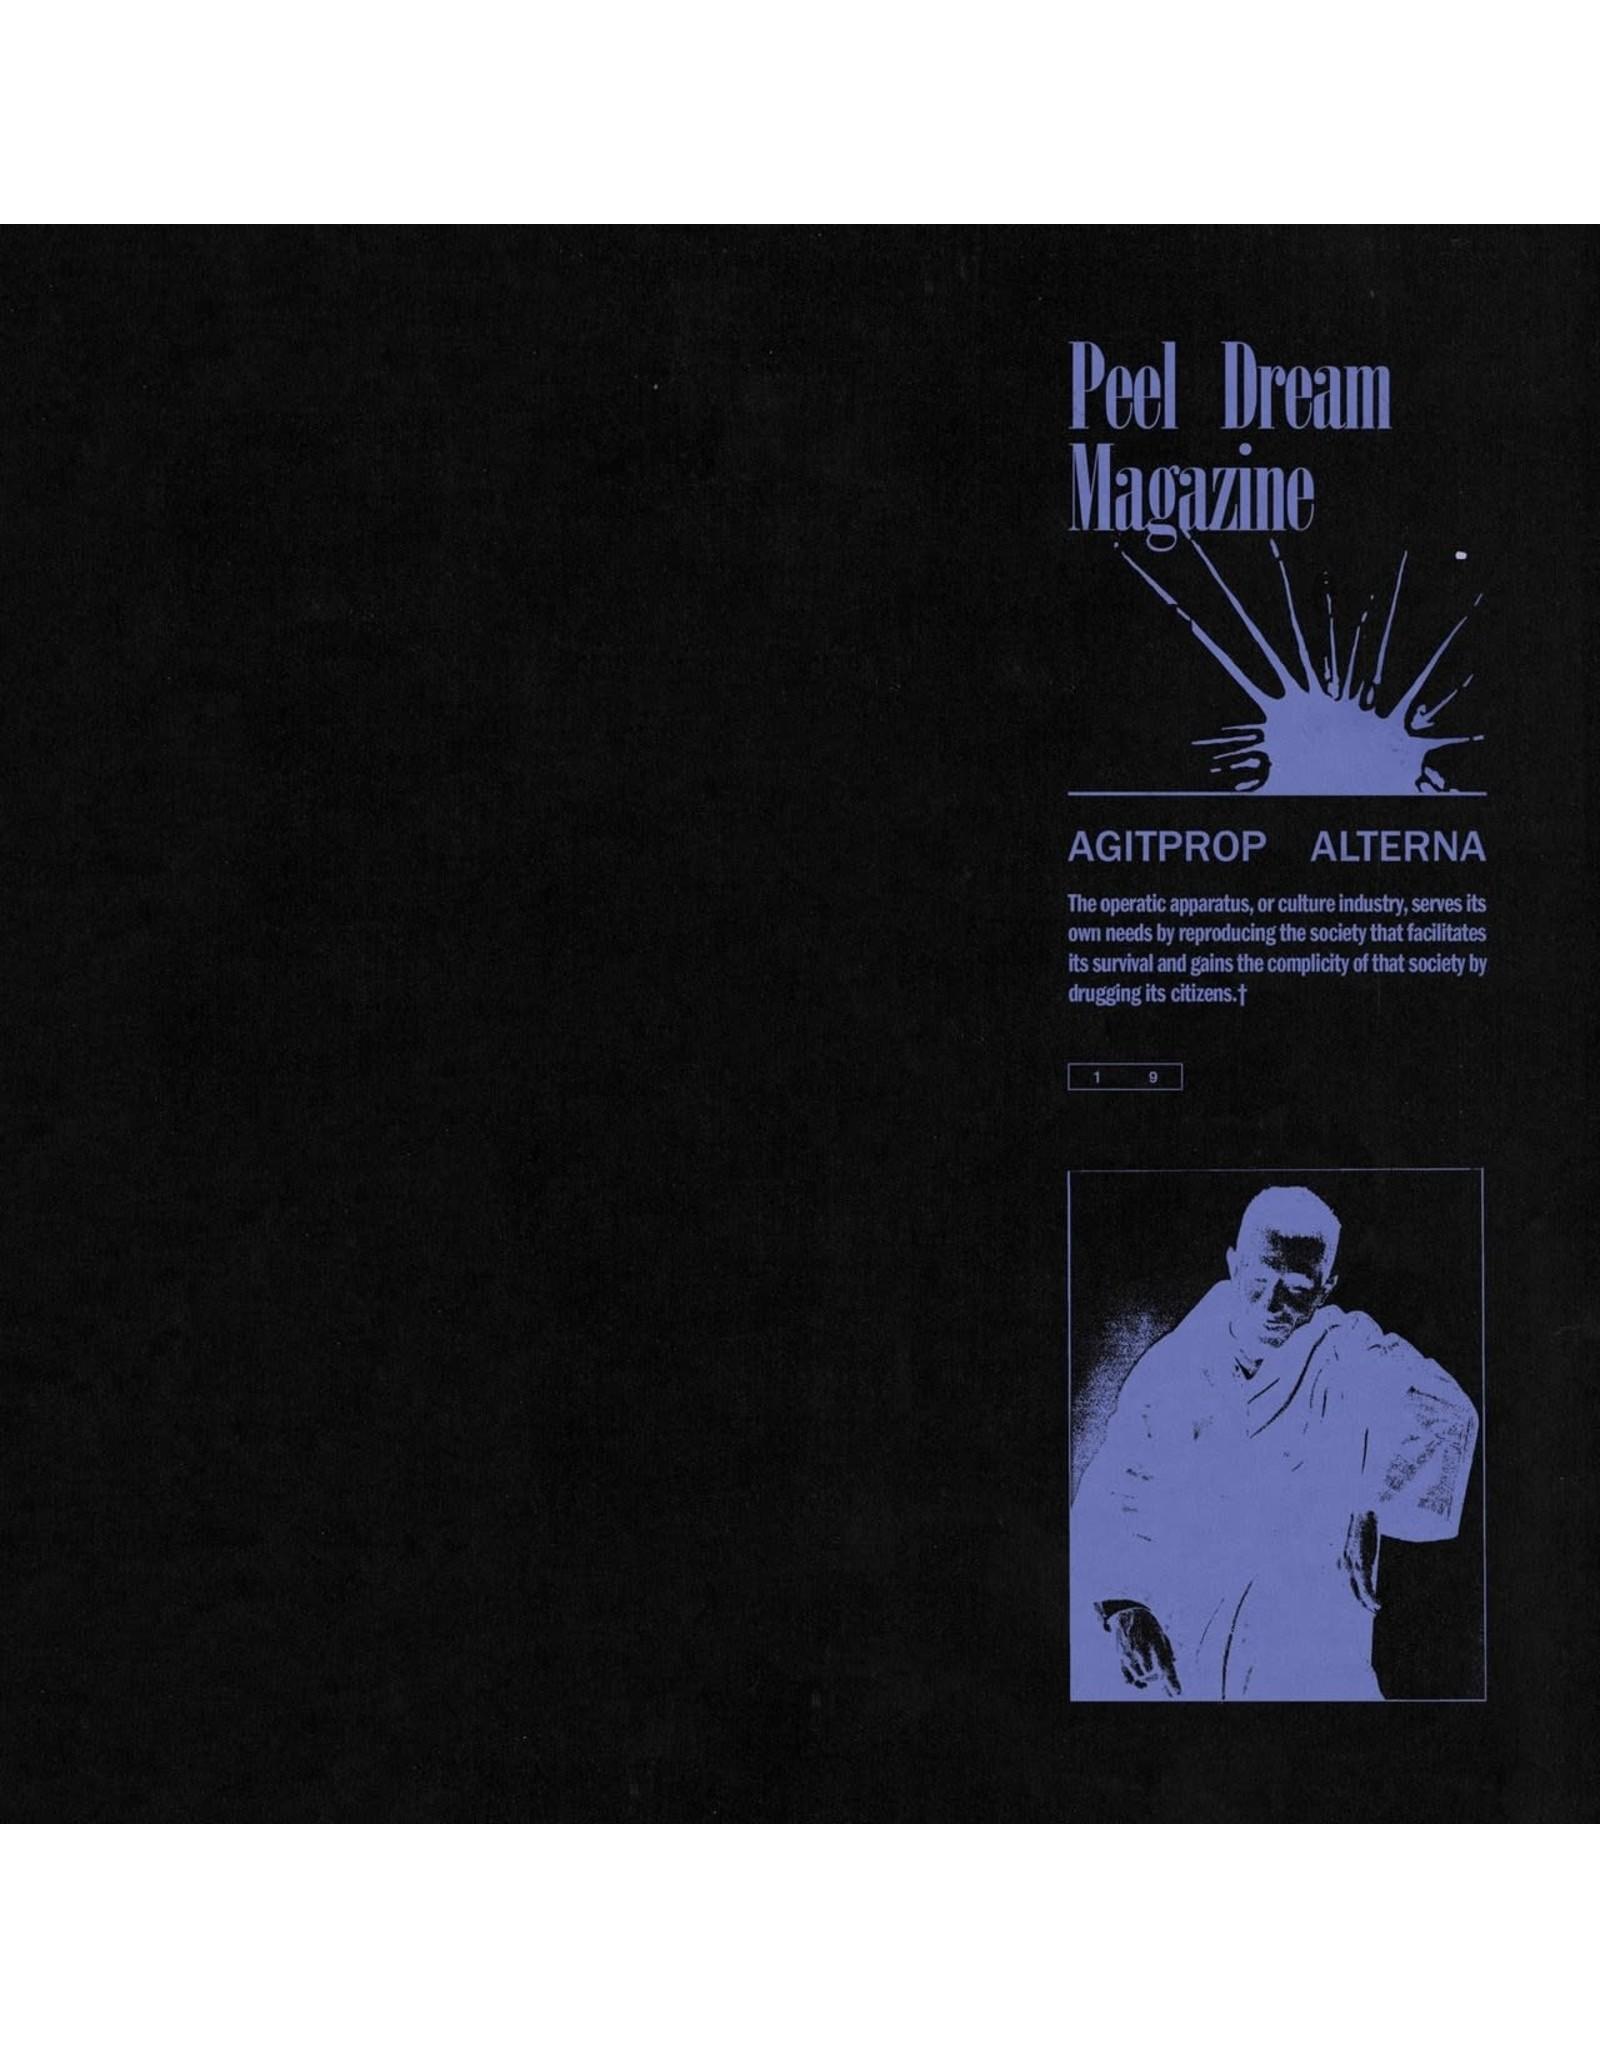 Peel Dream Magazine - Agitprop Alterna LP